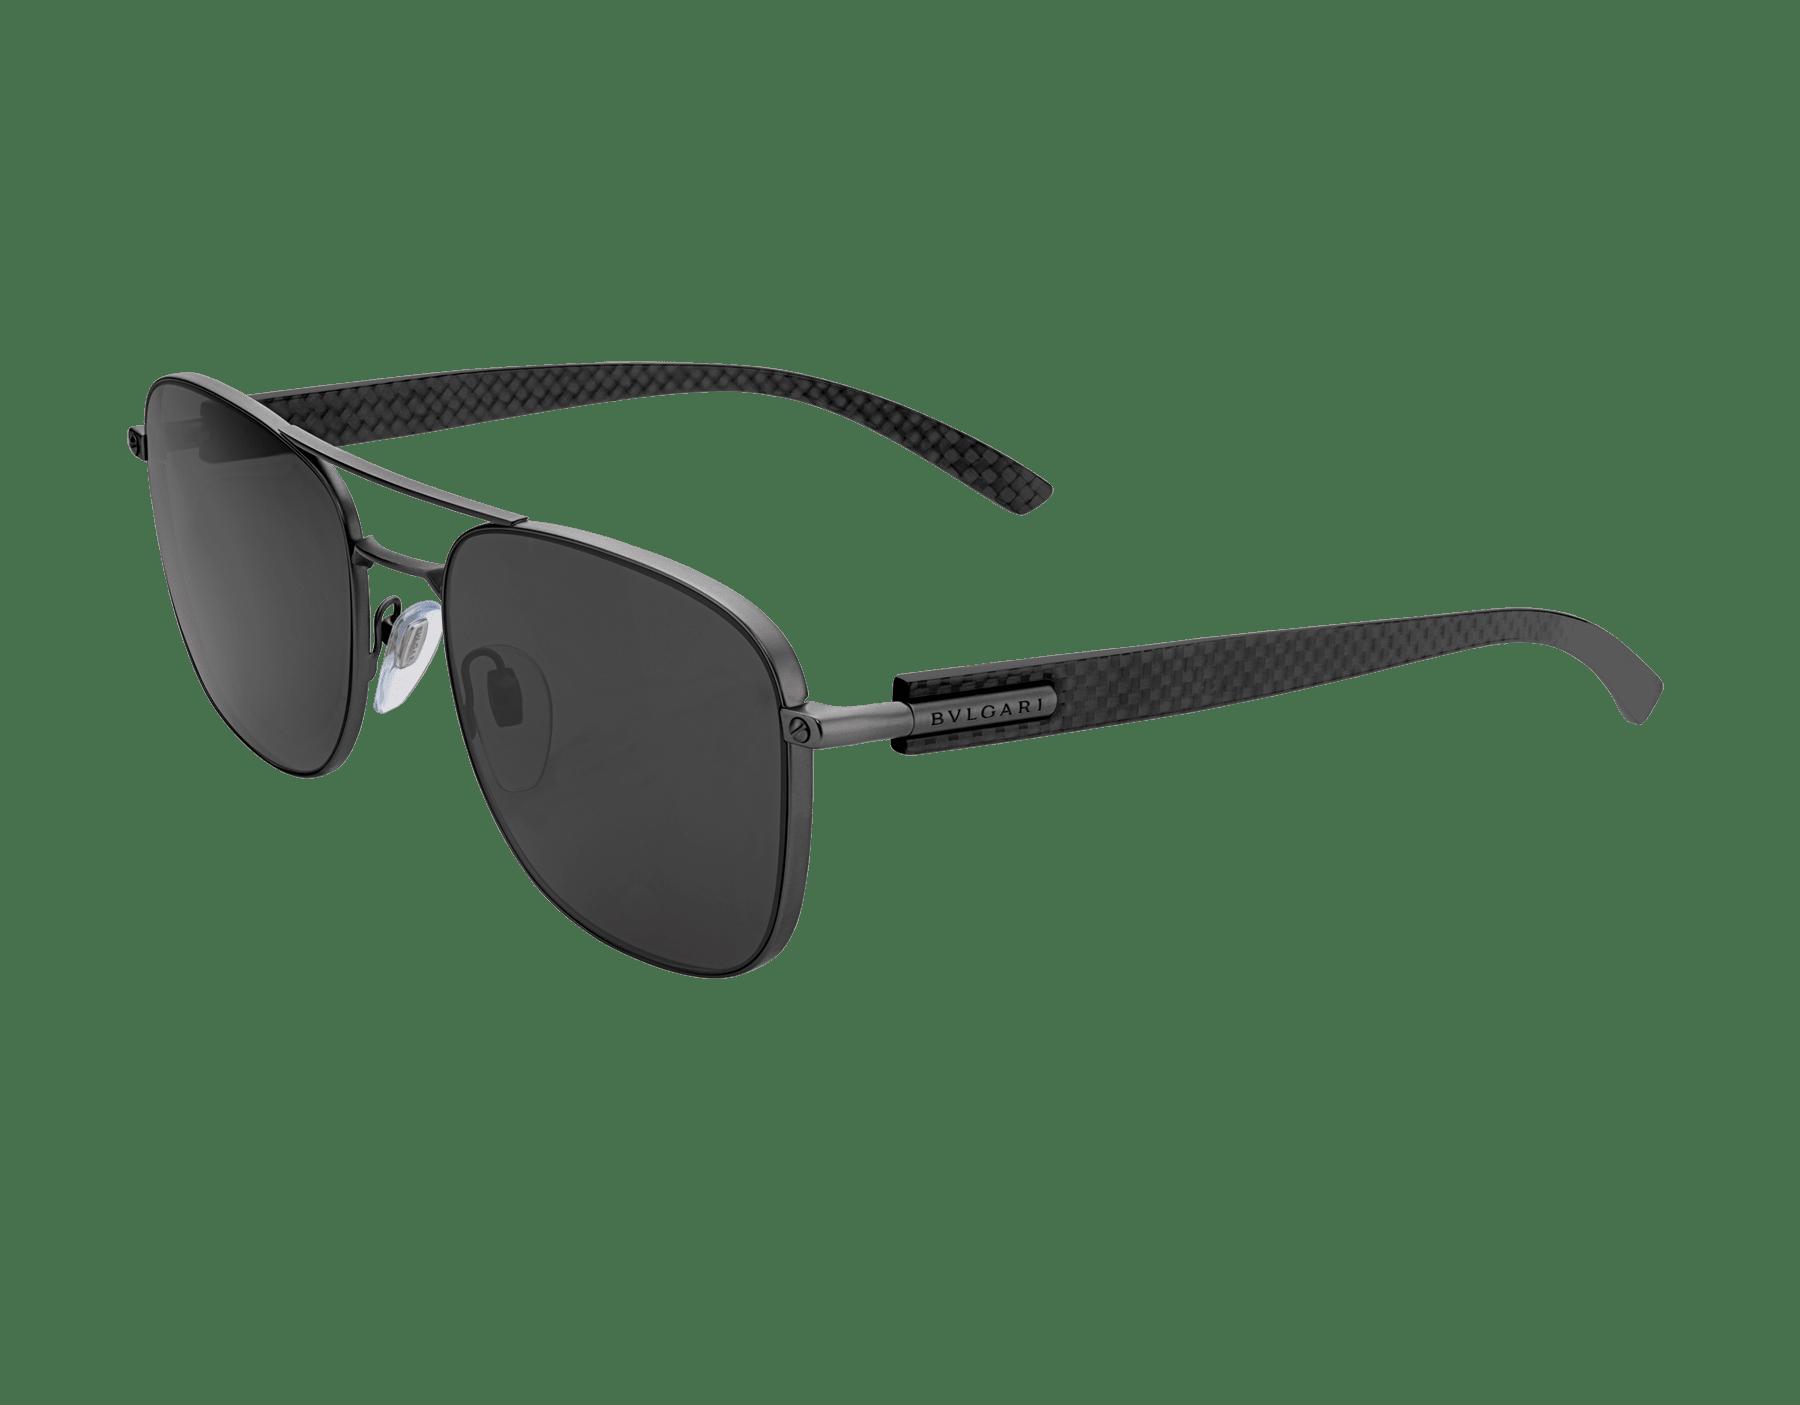 BVLGARI BVLGARI rectangular metal sunglasses with metal double bridge and carbon fiber arms. 903911 image 1